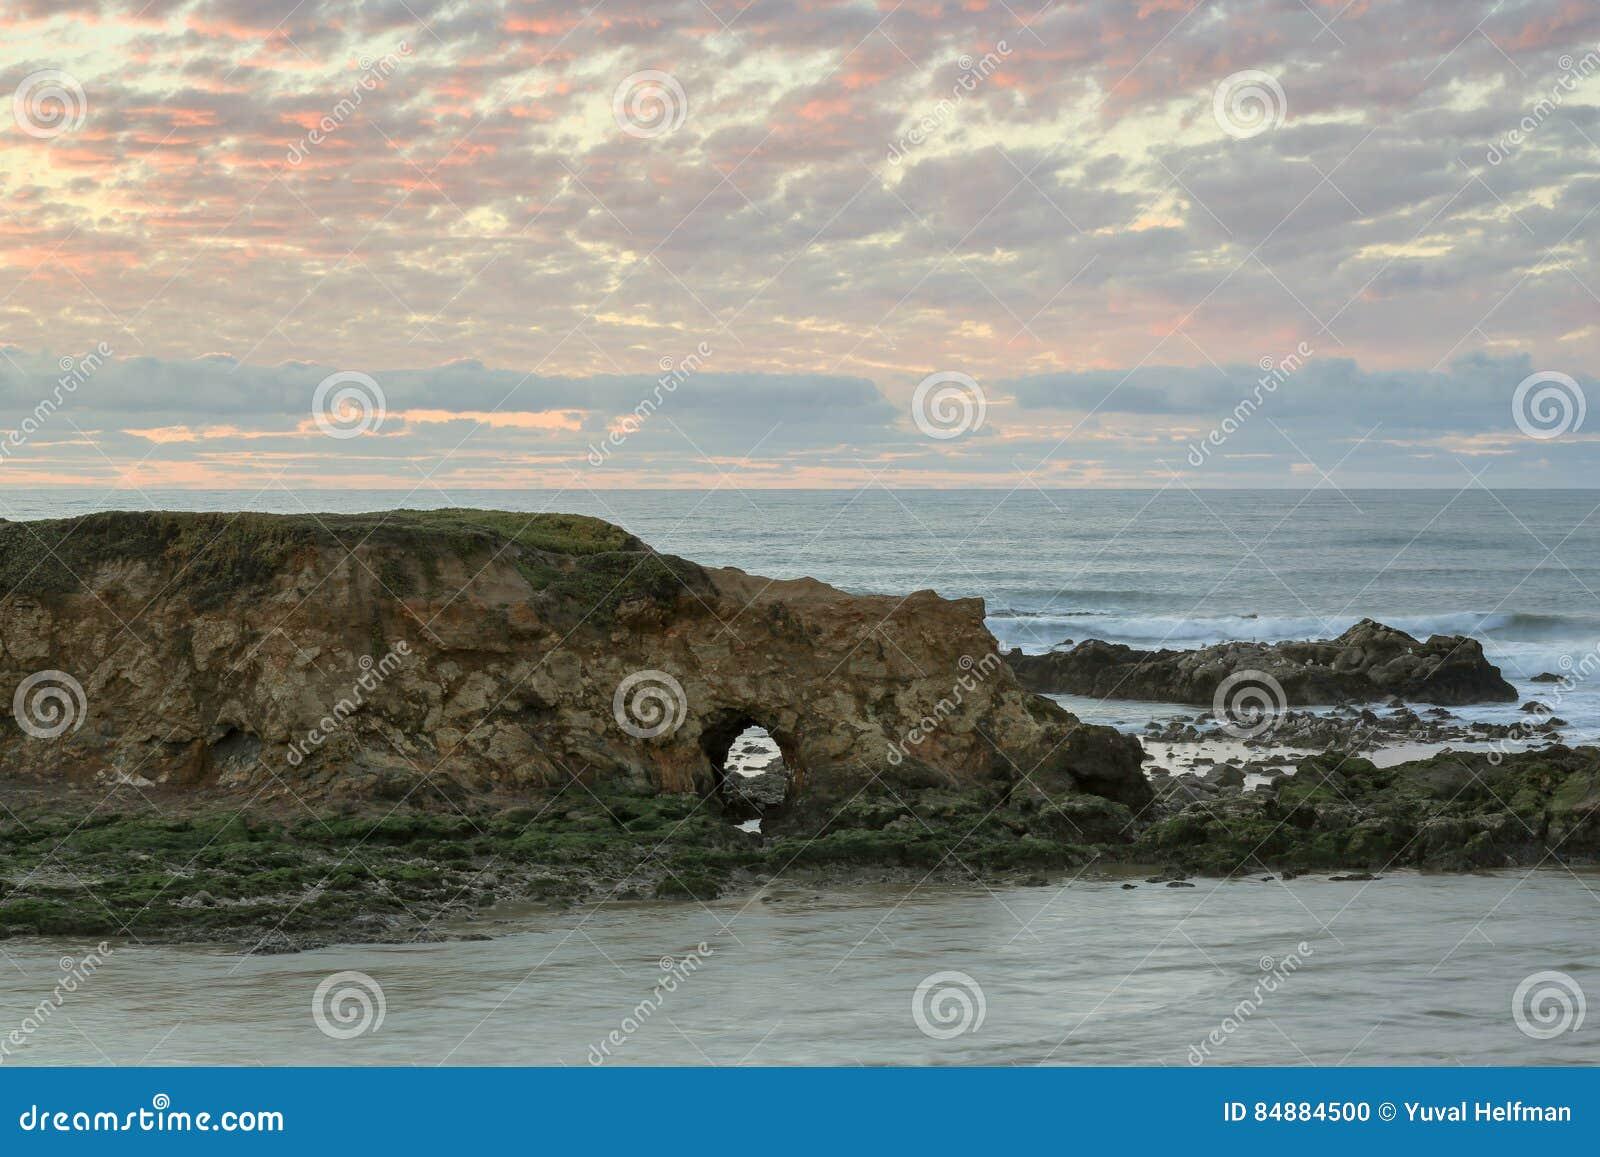 California san mateo county pescadero - Sunset At Pescadero State Beach San Mateo County California